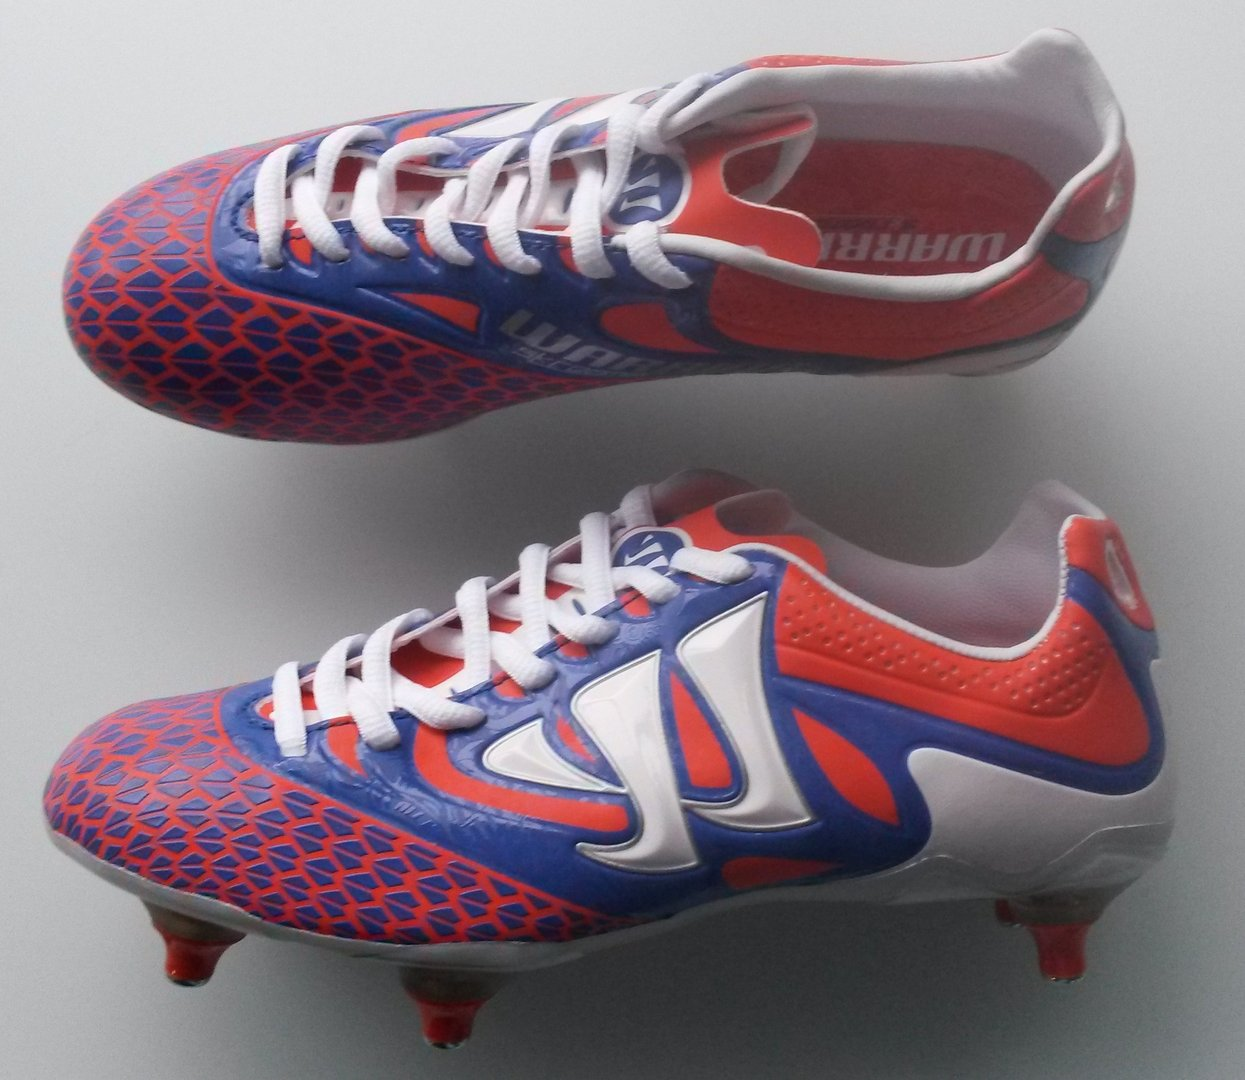 Warrior Skreamer football boots size 2 BNIB